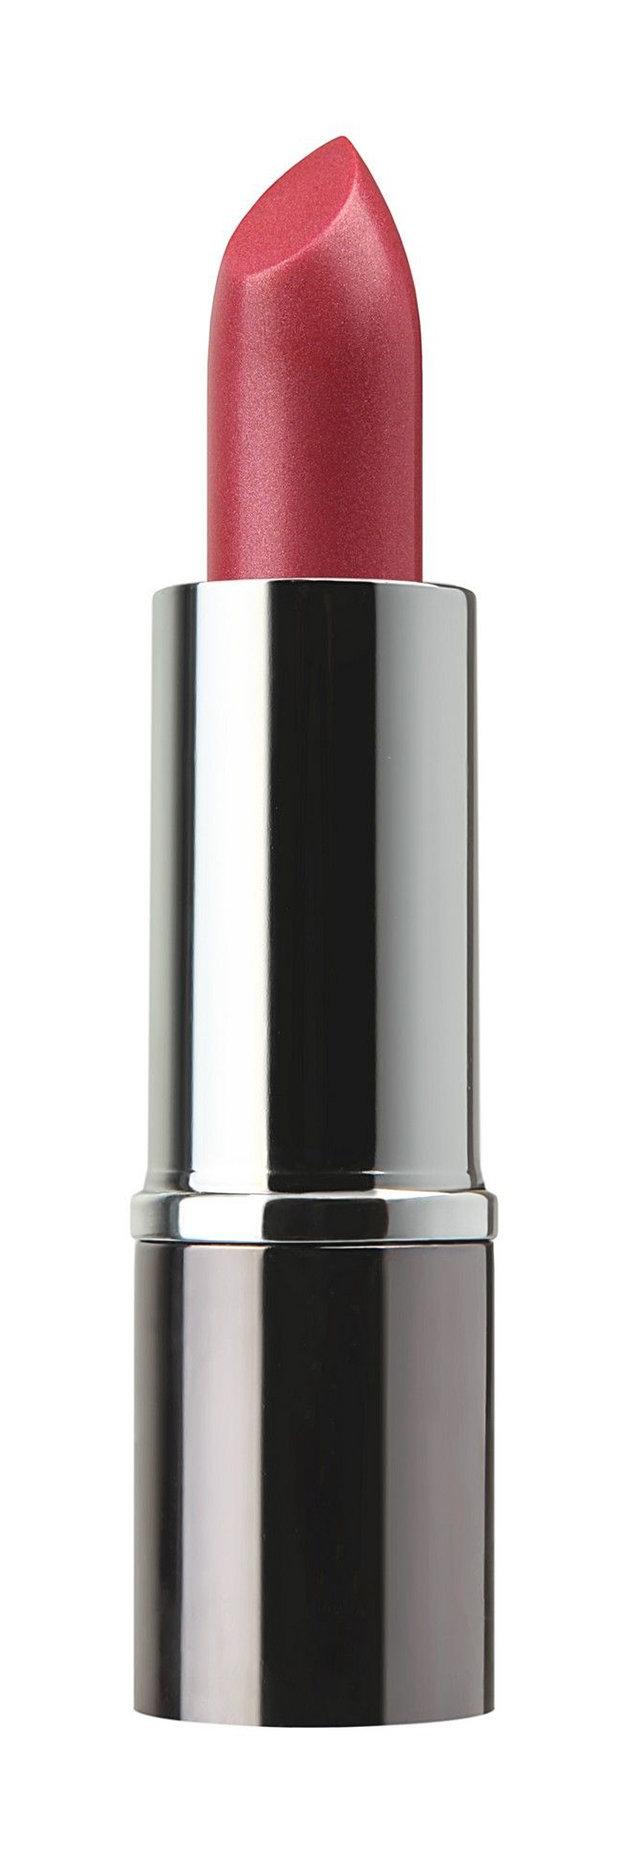 Limoni Помада Lip Stick Губная Увлажняющая тон 202, 4,5 мл цены онлайн